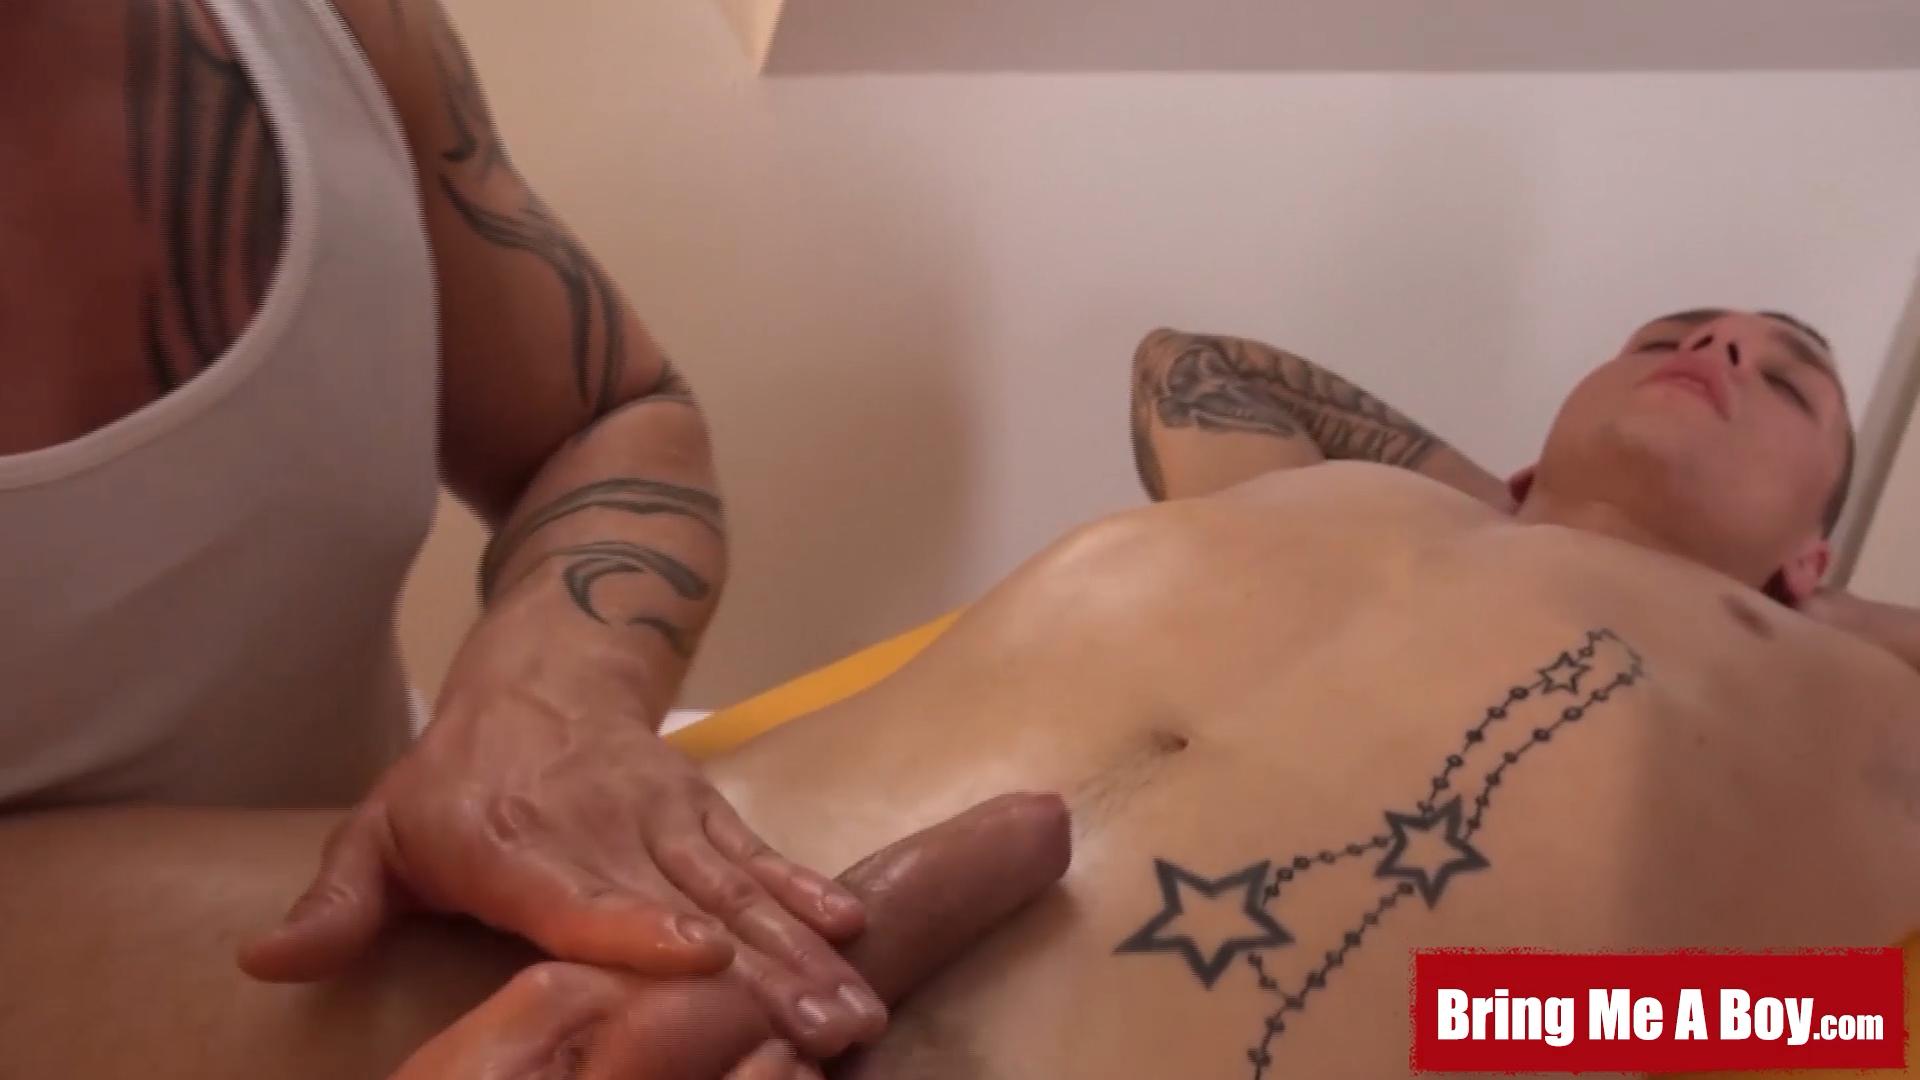 Massage the Boy